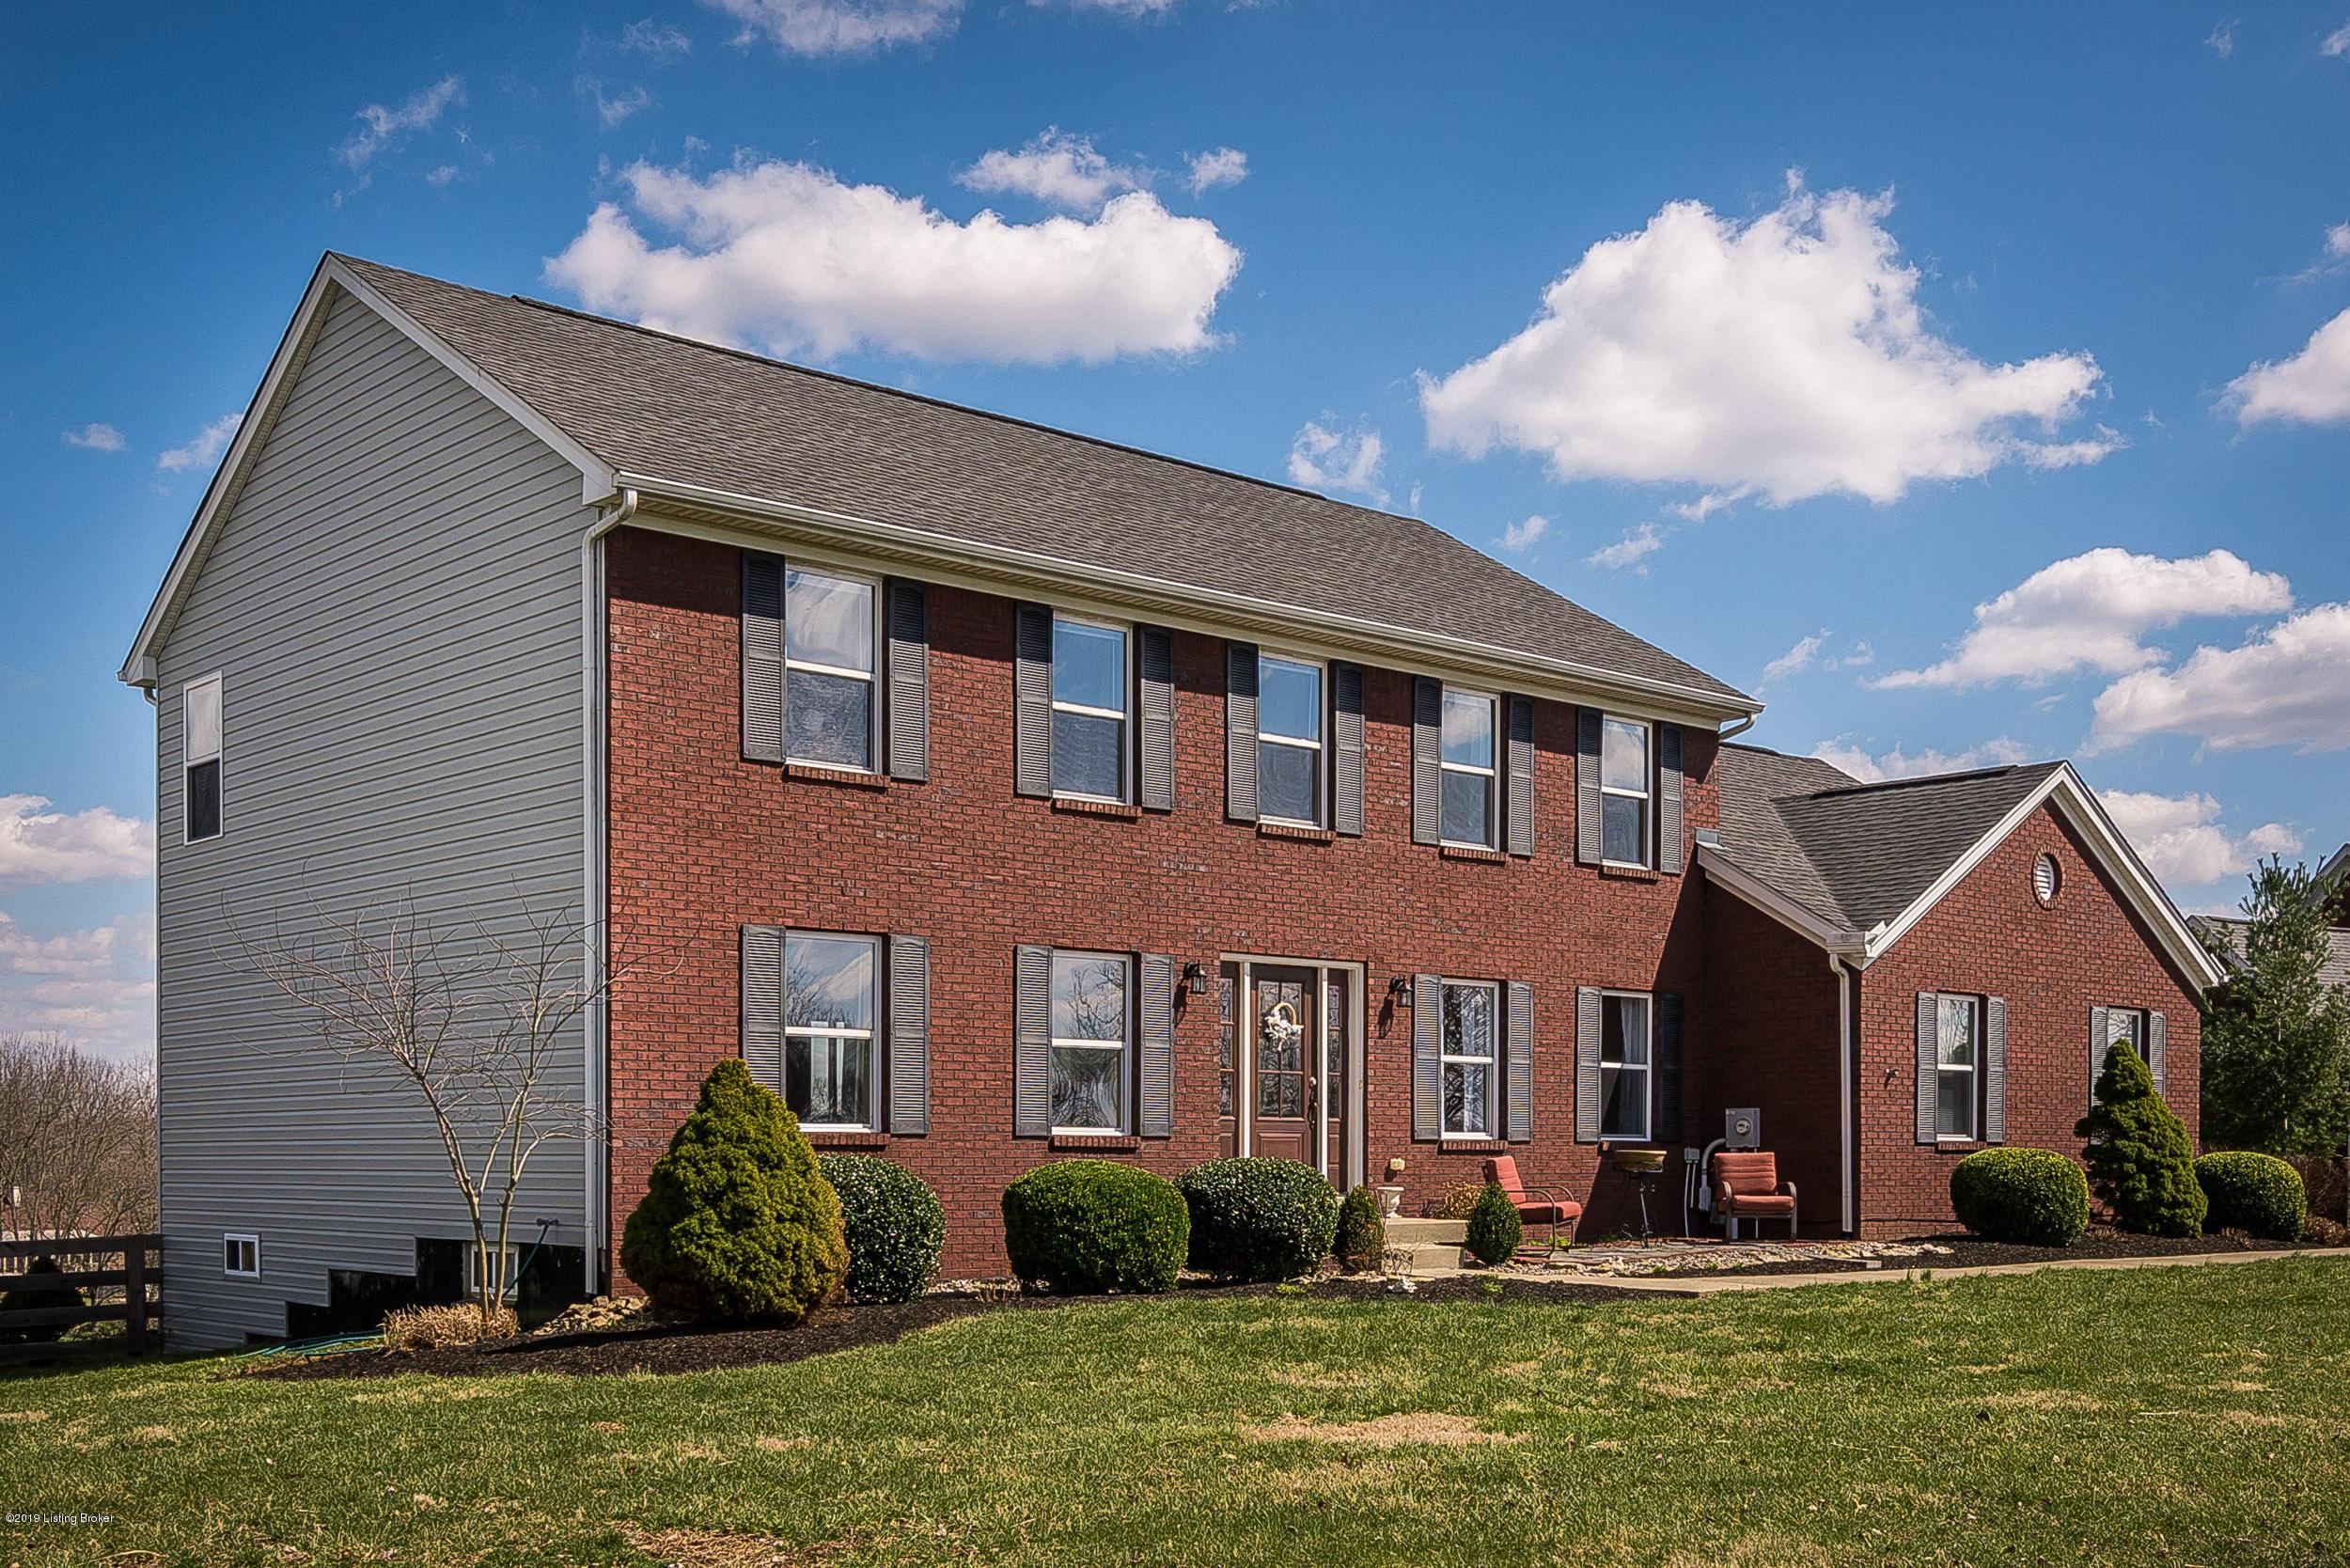 269 Kristen Dr, Fisherville, Kentucky 40023, 4 Bedrooms Bedrooms, 8 Rooms Rooms,3 BathroomsBathrooms,Residential,For Sale,Kristen,1527156